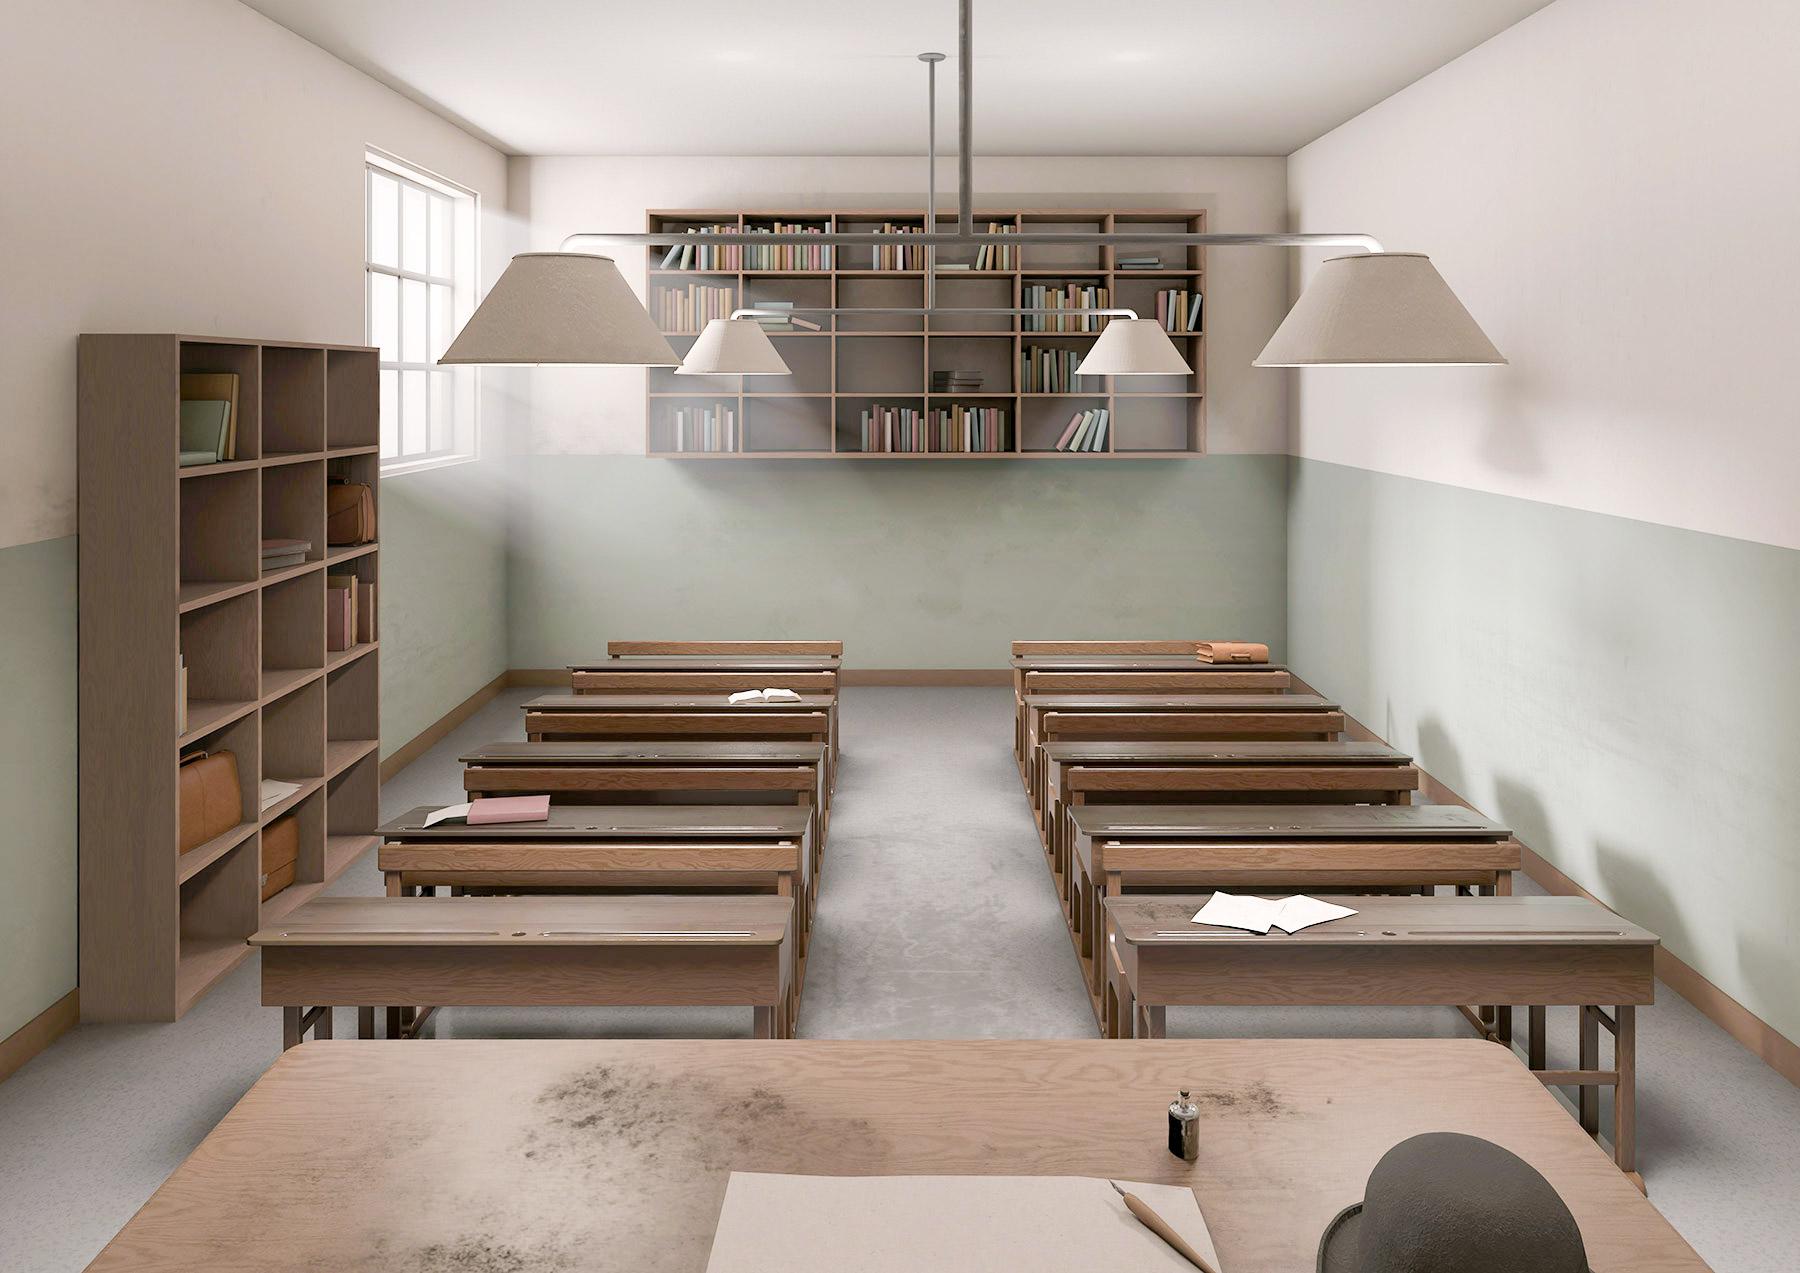 Raumbilder III Schulraum